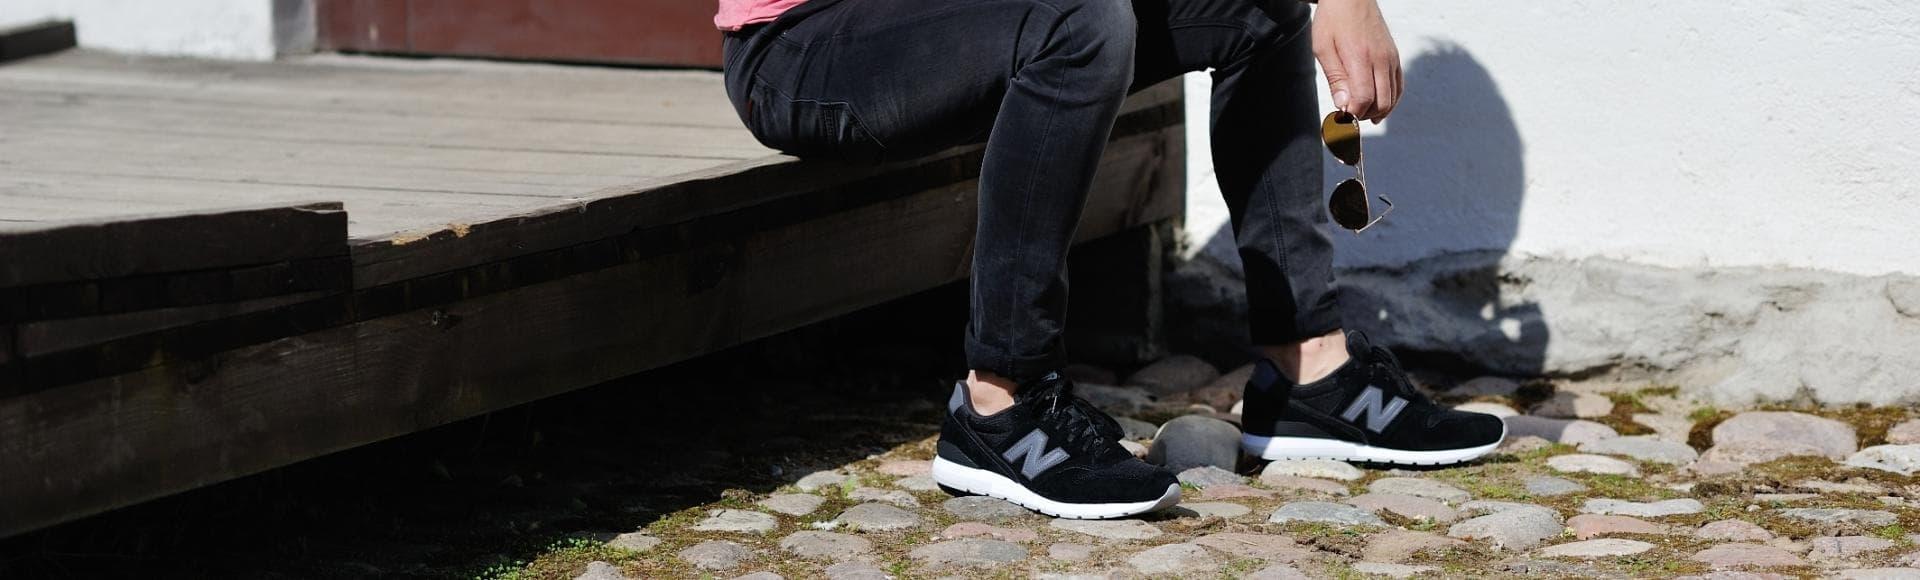 New Balance footwear, New Balance shoes - Sportsman24